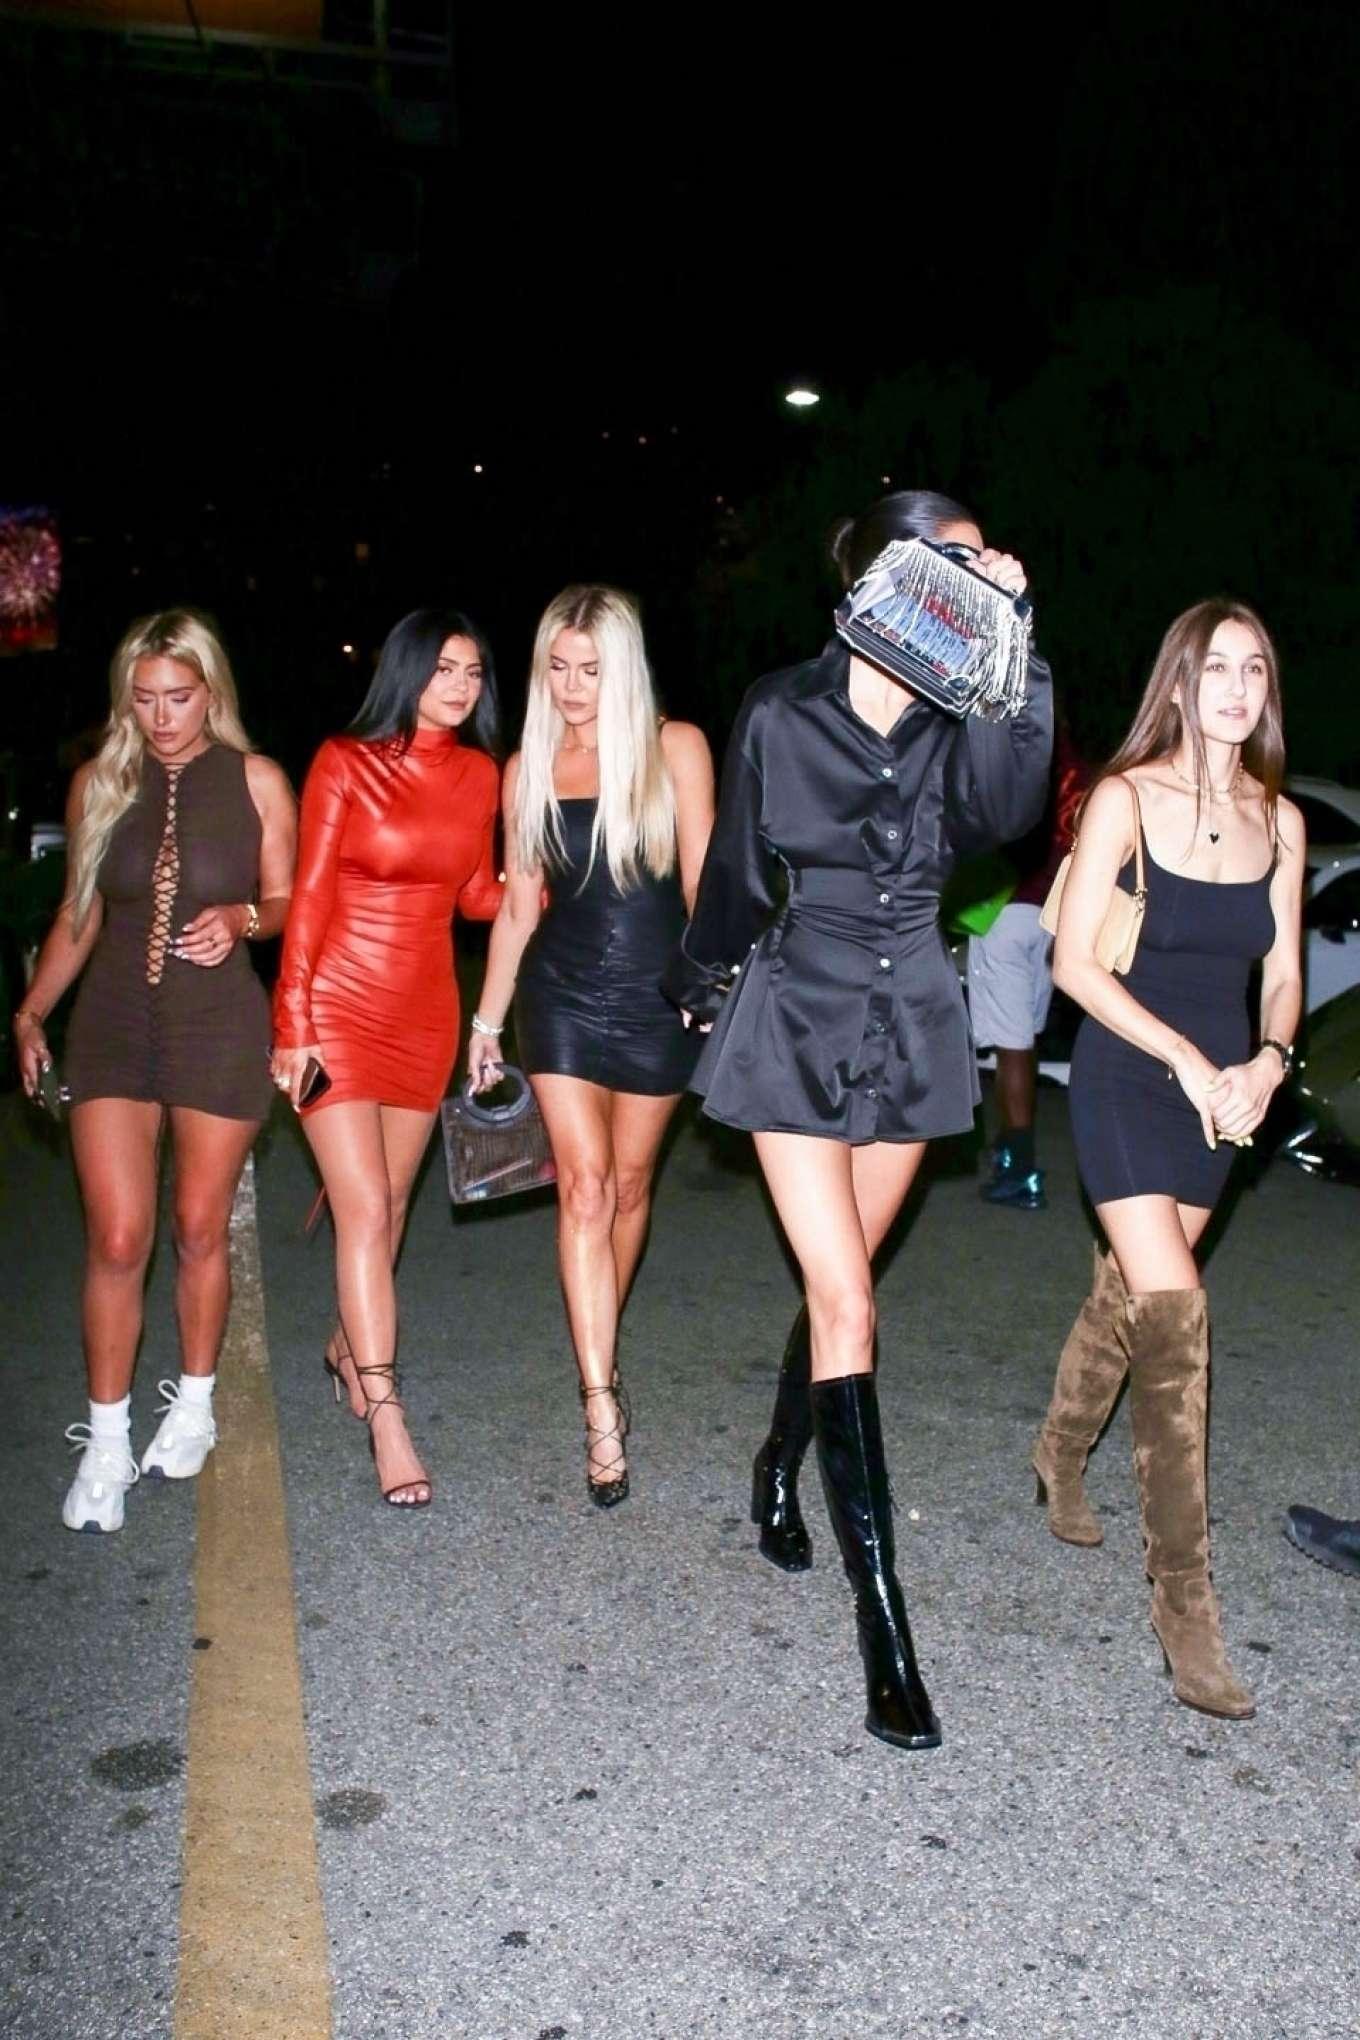 Khloe Kardashian, Stassie Karanikolaou, Kylie and Kendall Jenner - Night out in LA